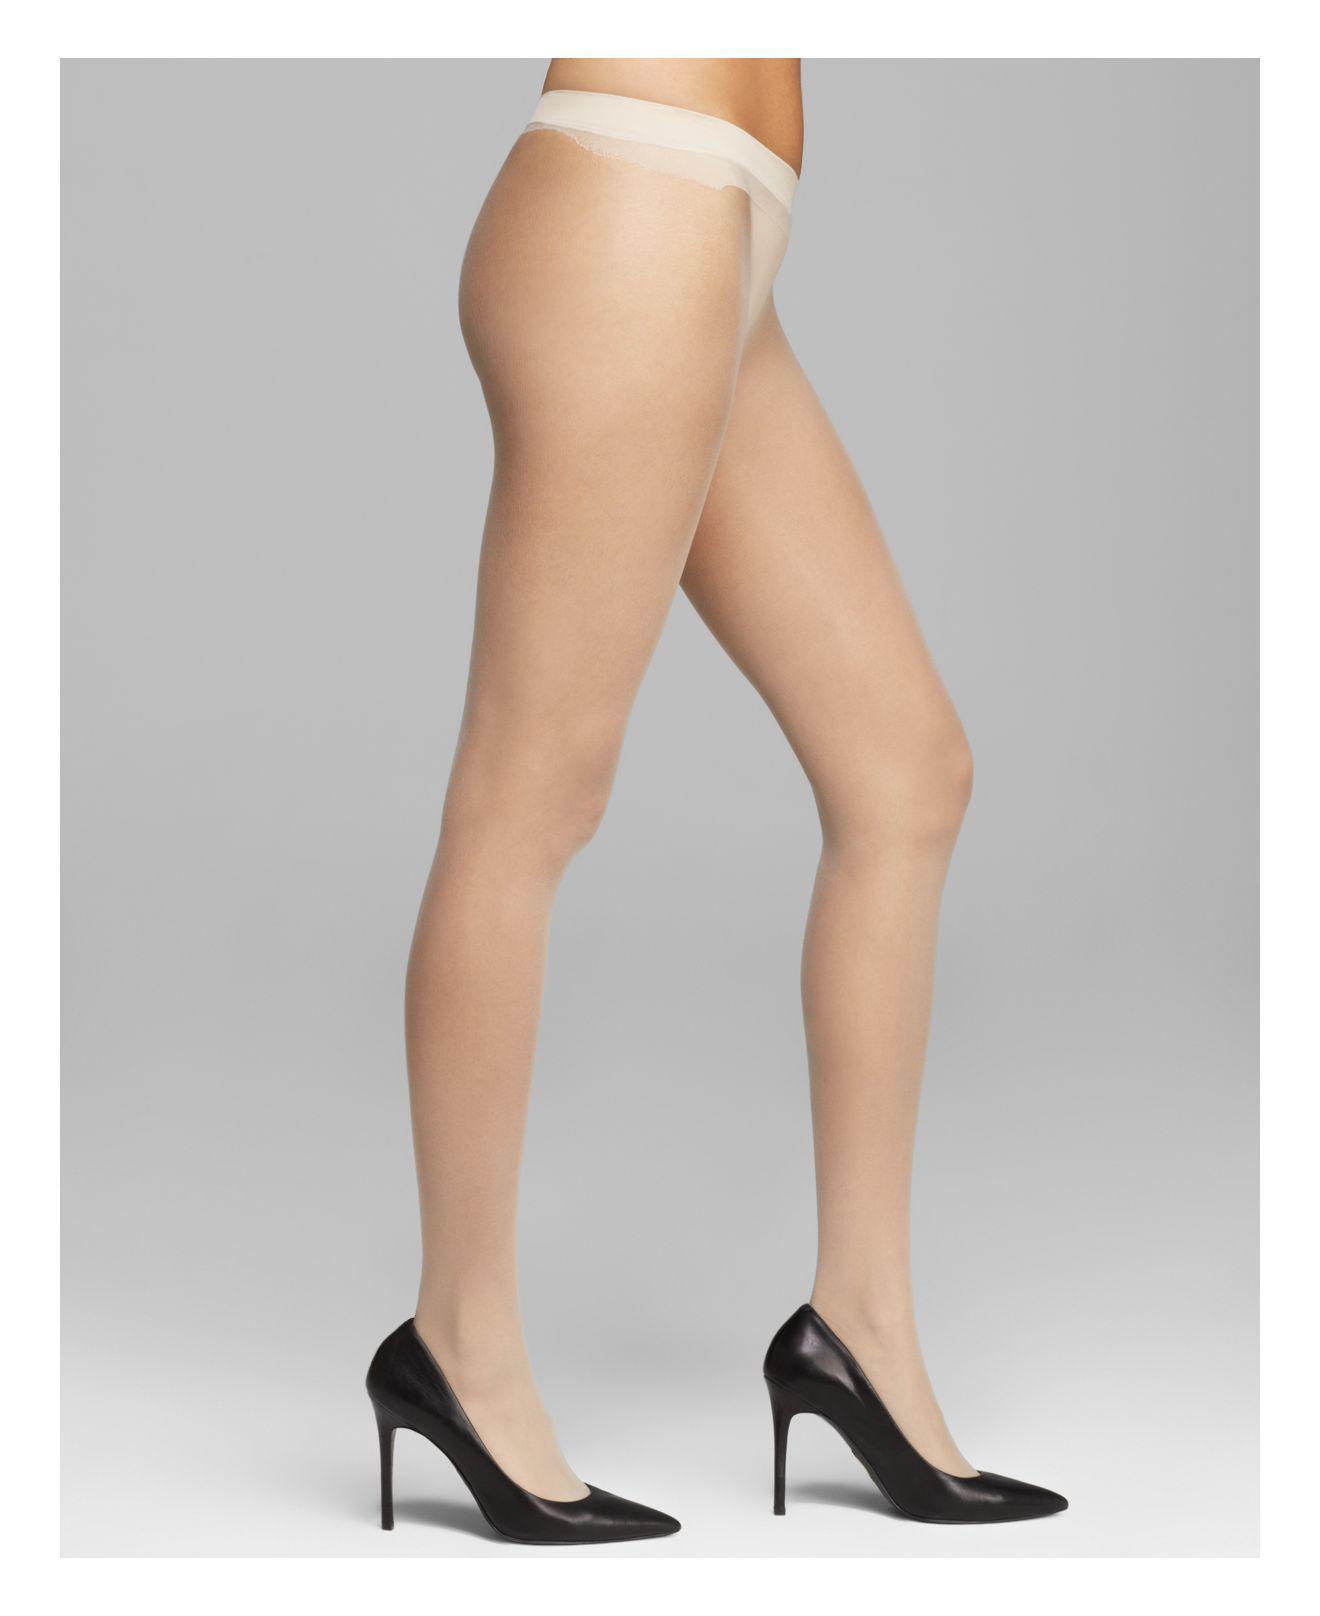 0d9131eb05f14 Calvin Klein Sheer Essentials Seamless Tights in Natural - Lyst